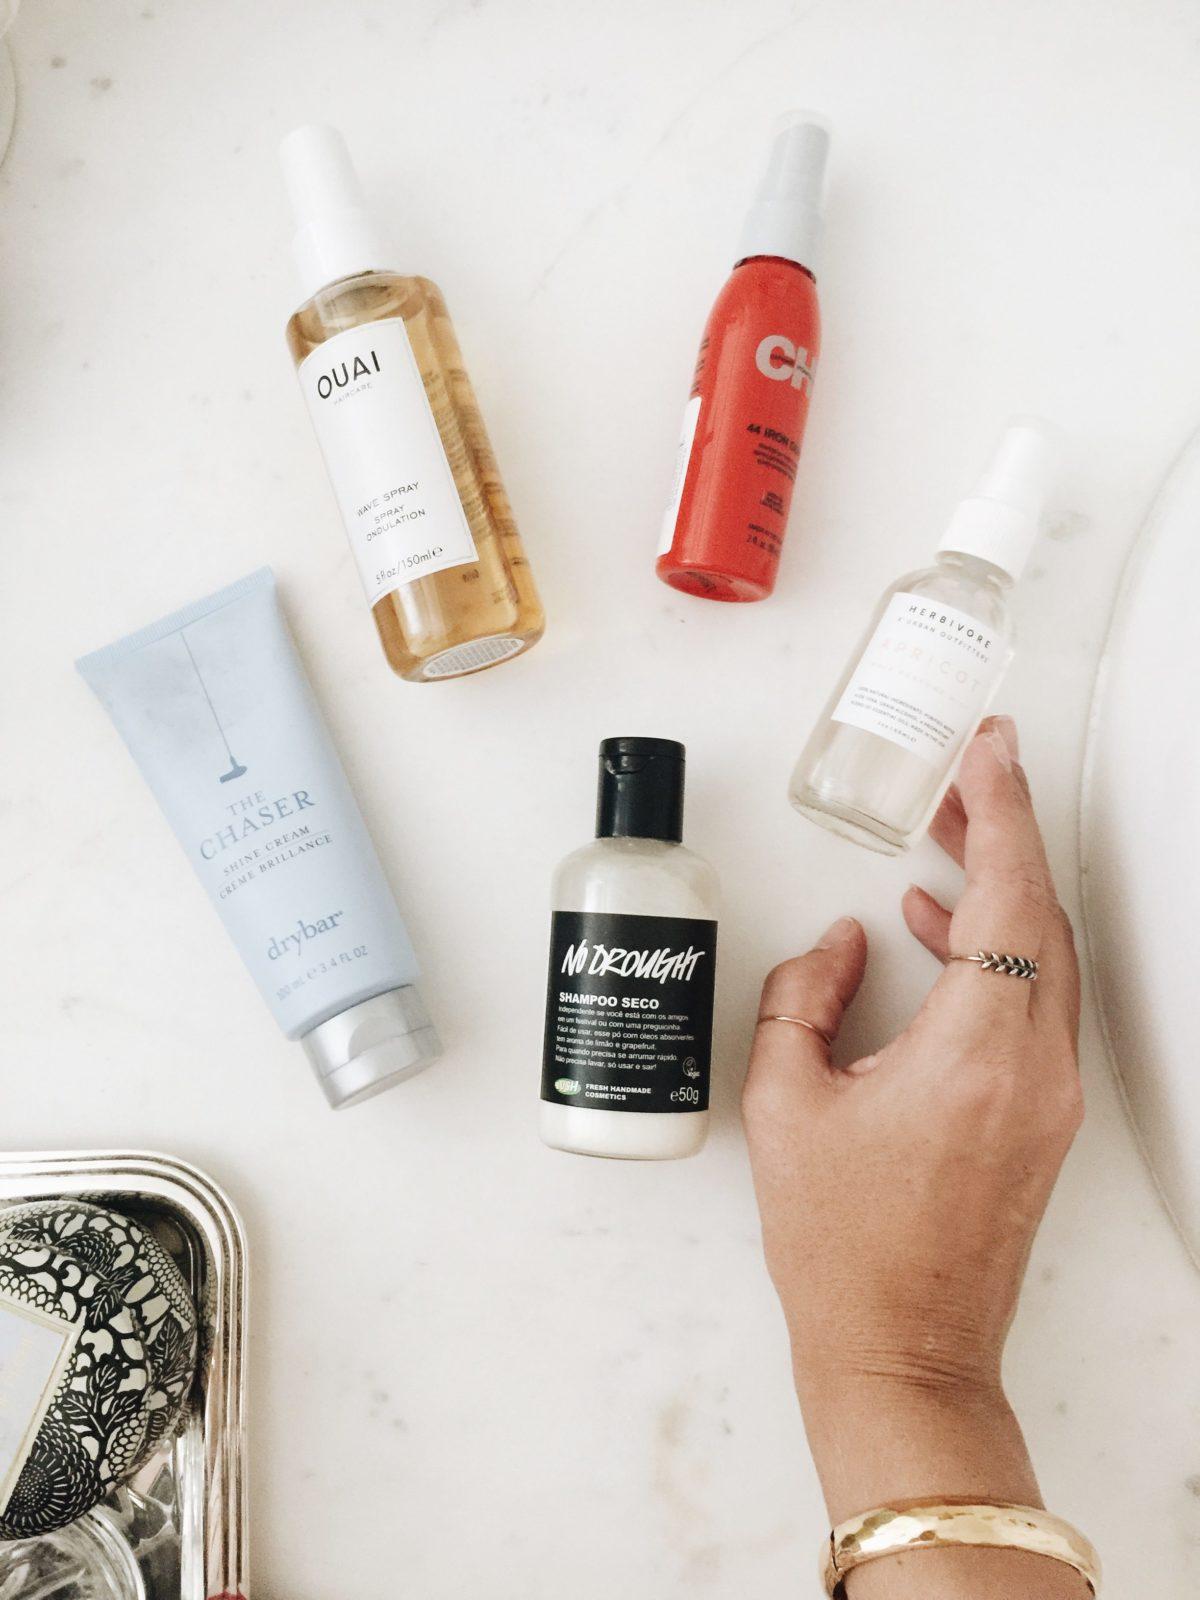 IMG 3449 e1488422959324 - Favorite hair products | favoritos para o cabelo